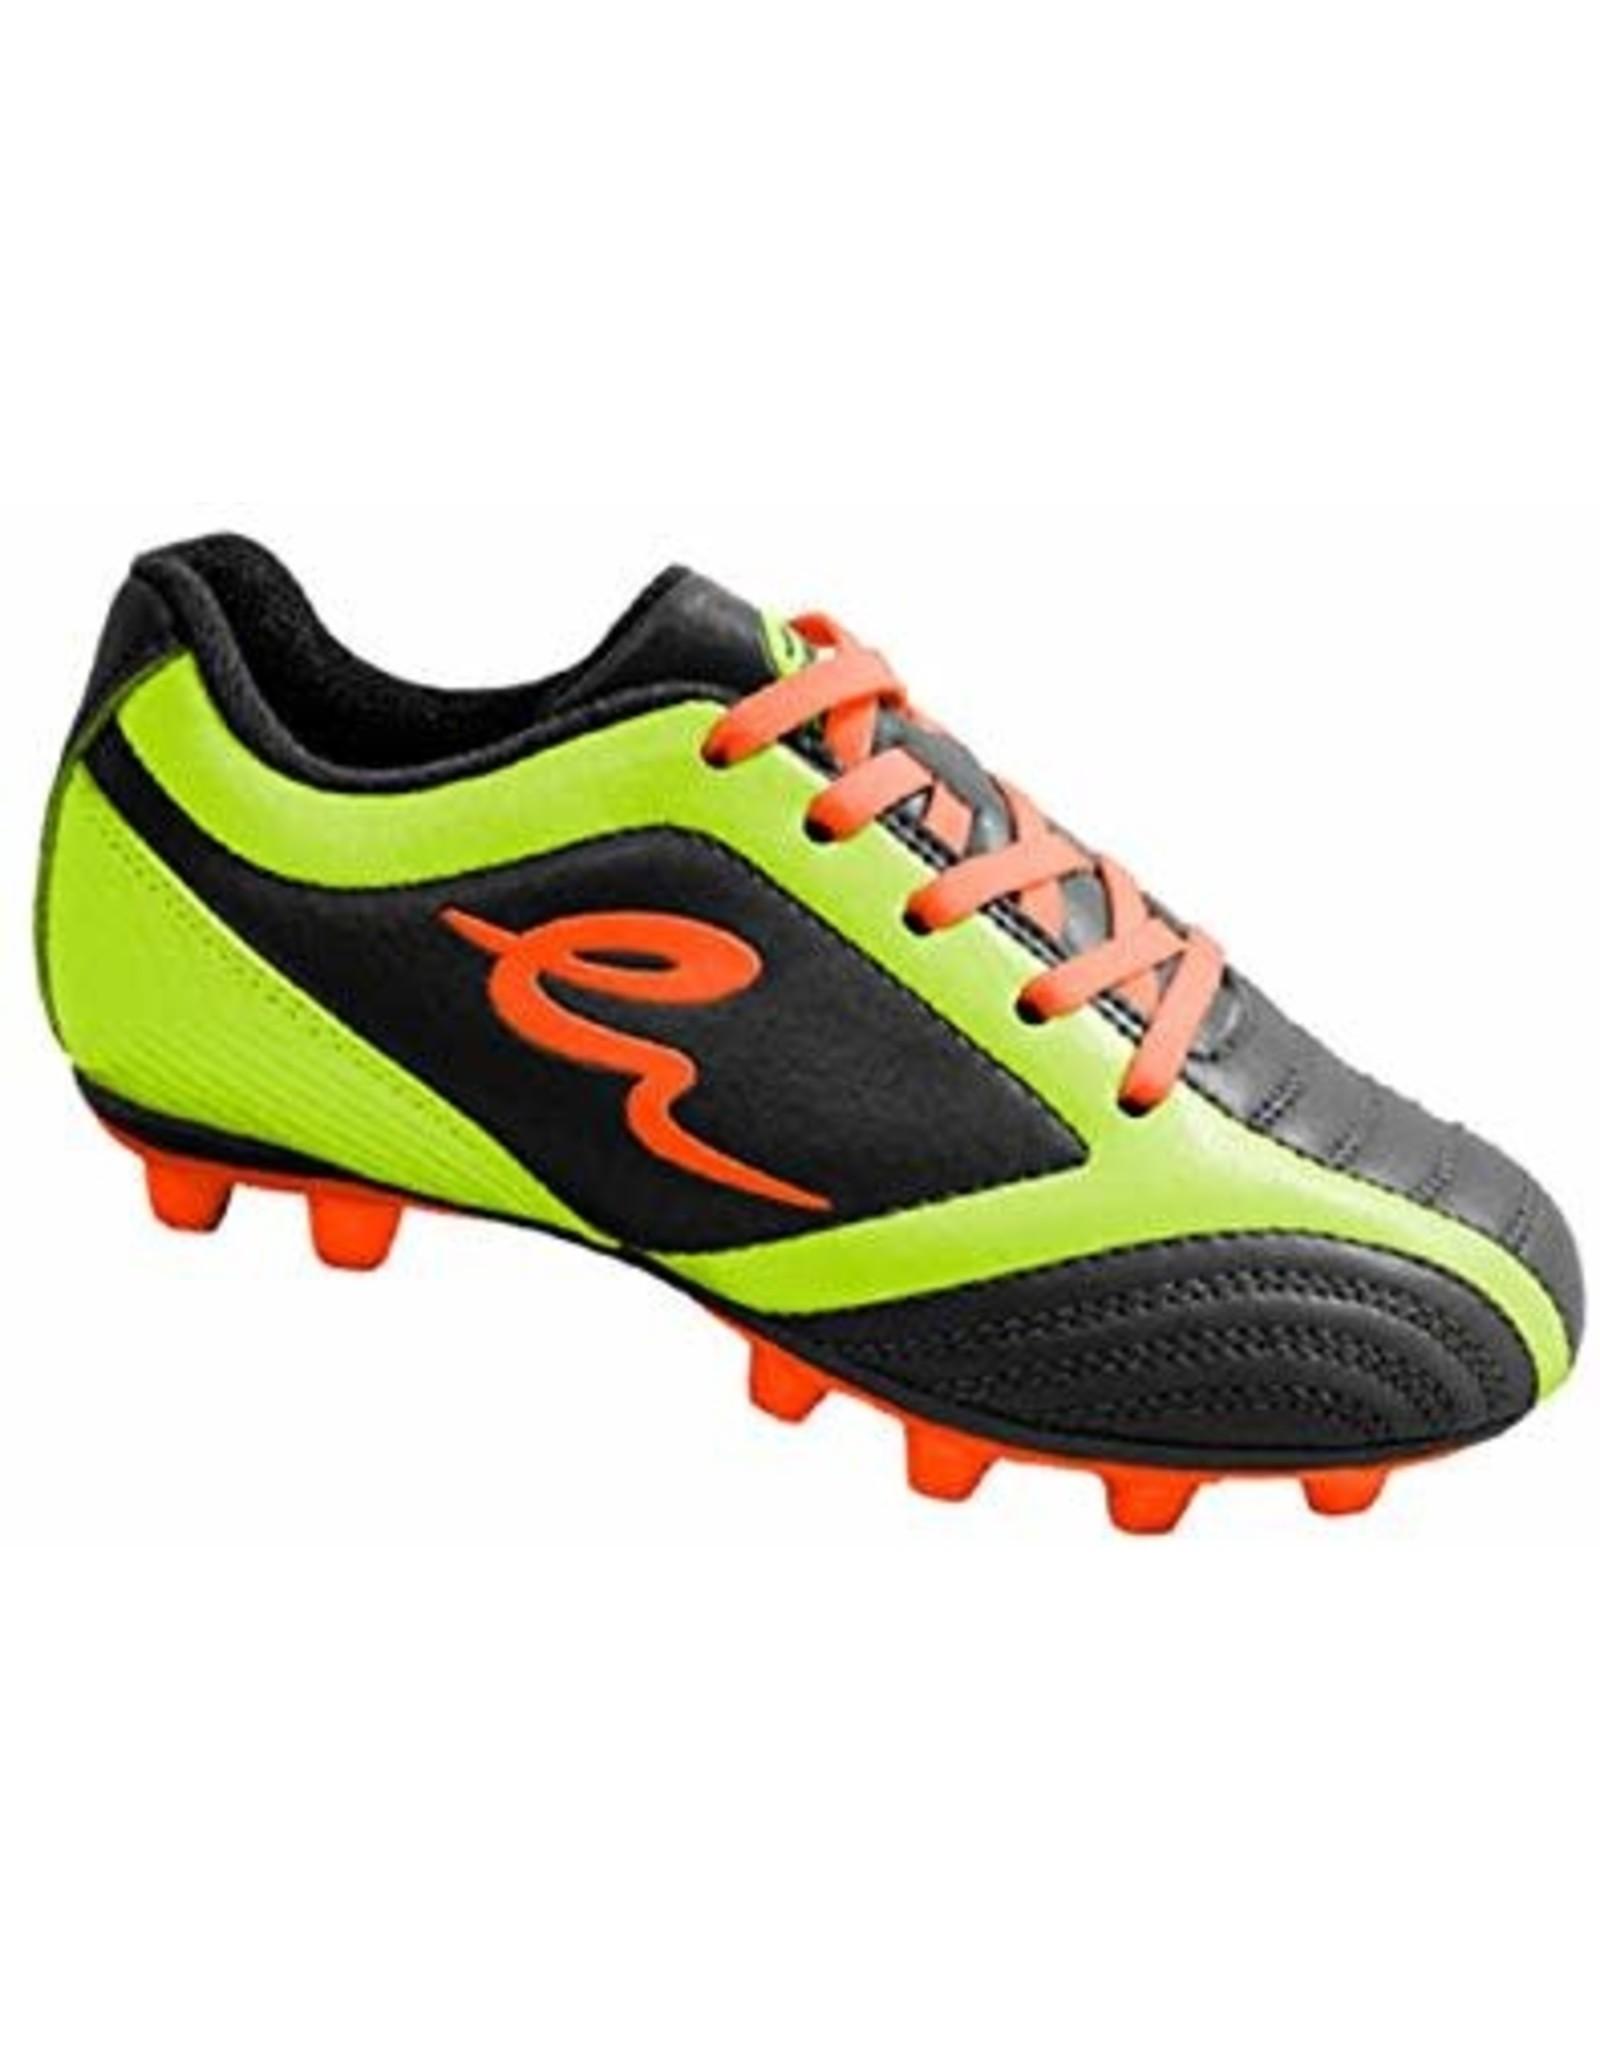 Eletto Eletto Outdoor Shoes Mondo II RB Senior Cleats (Black/Fluo Yellow)